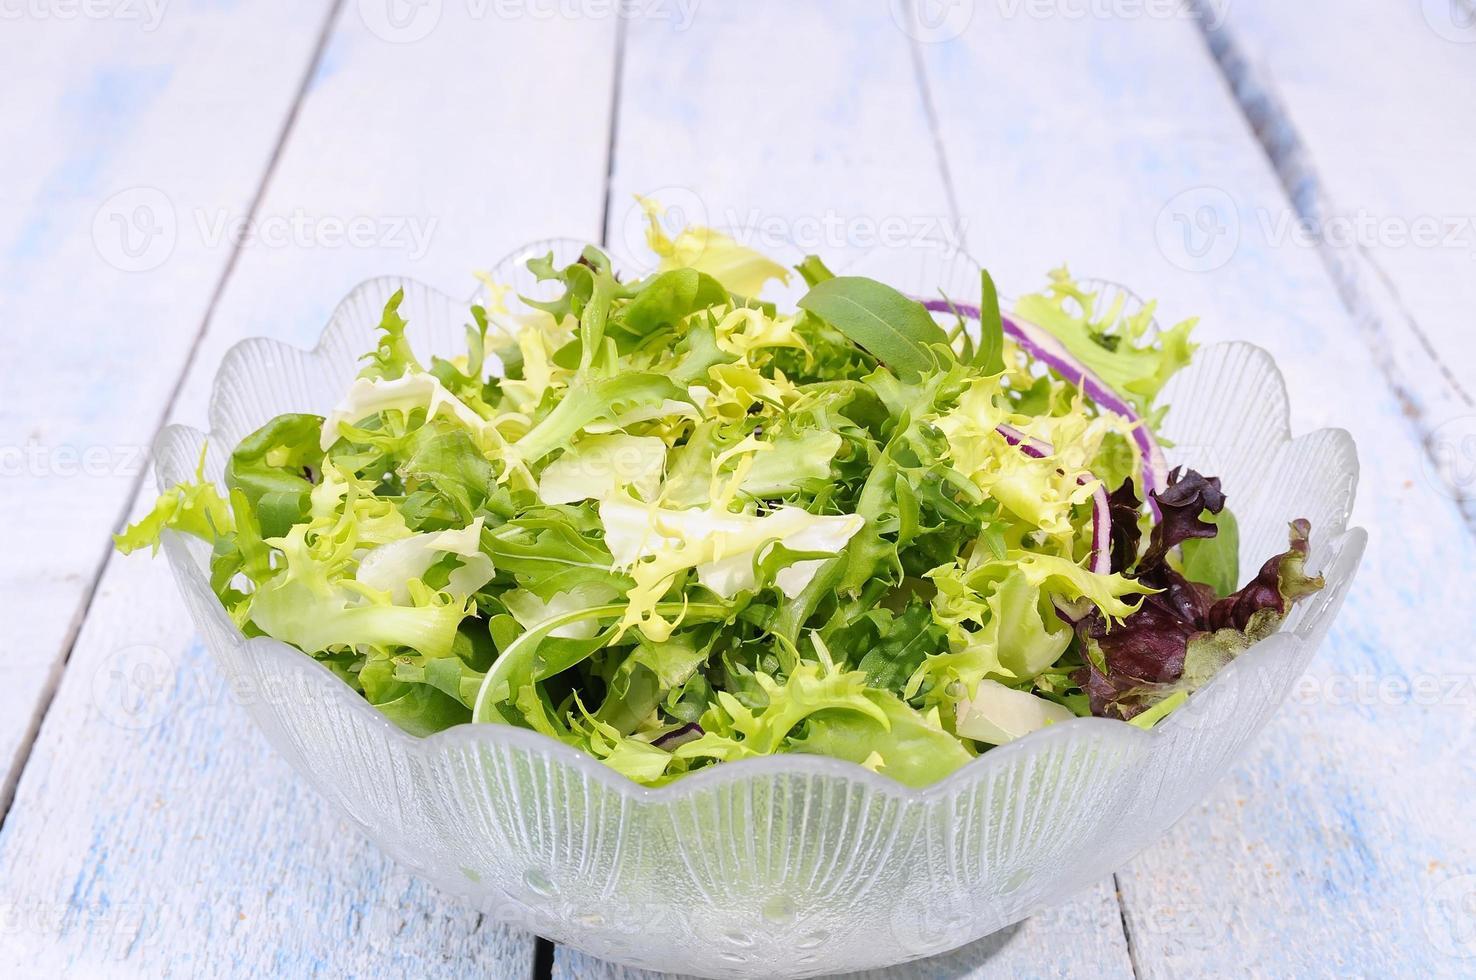 Lettuce. photo